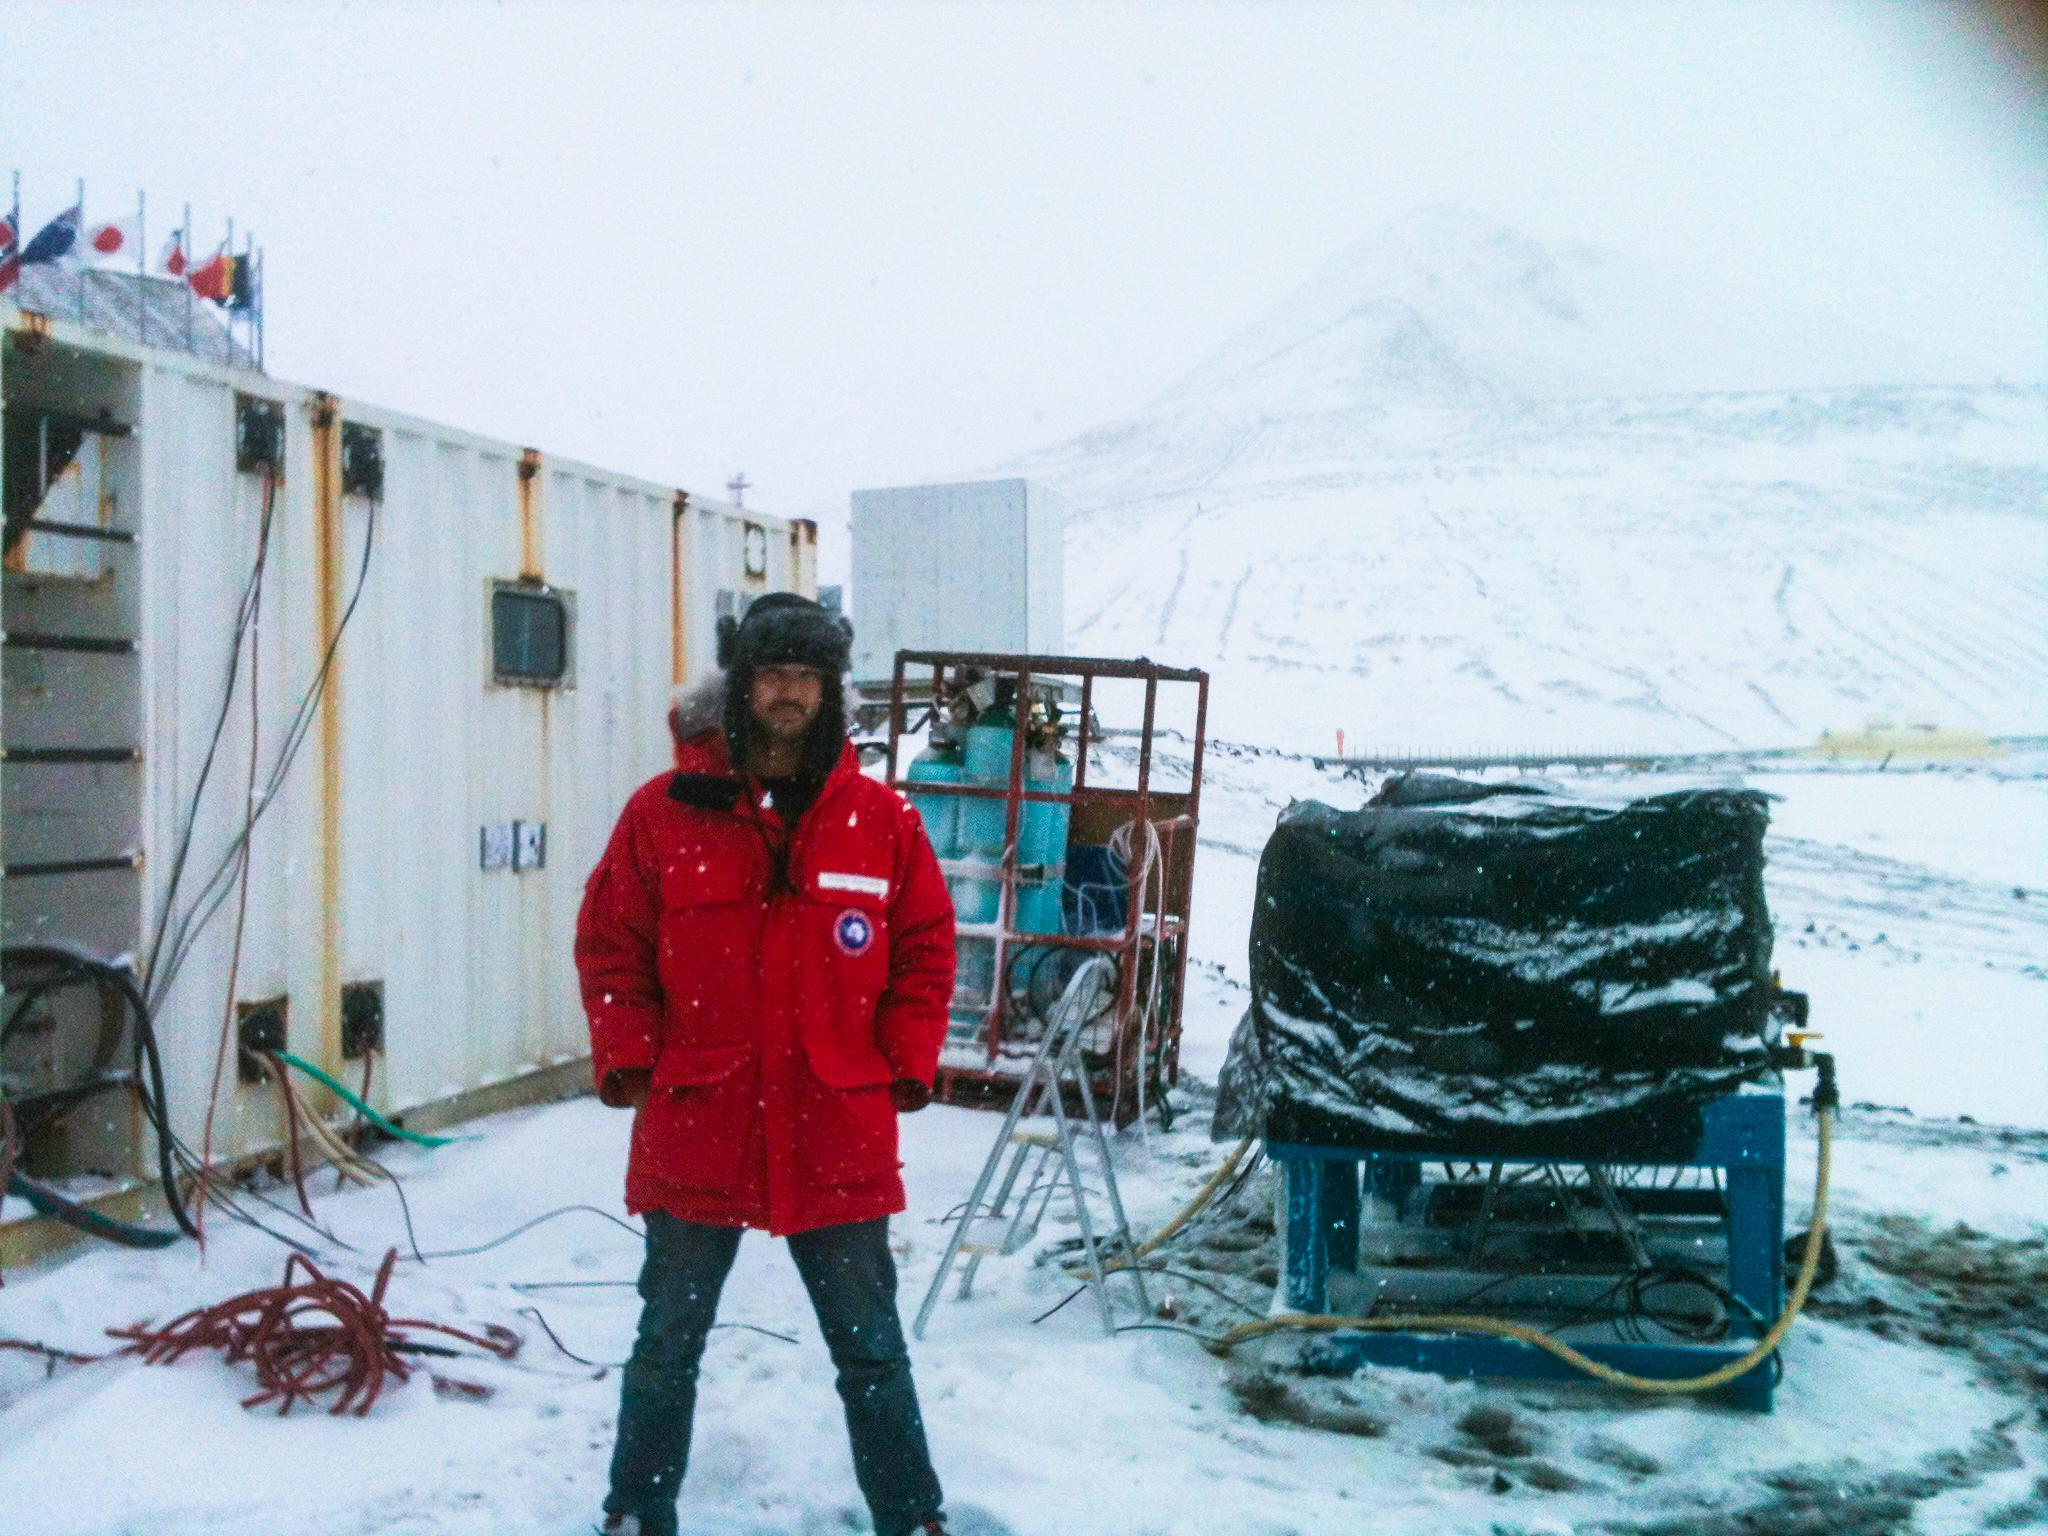 Nate_studying_global_Change_antarctica-2.jpg